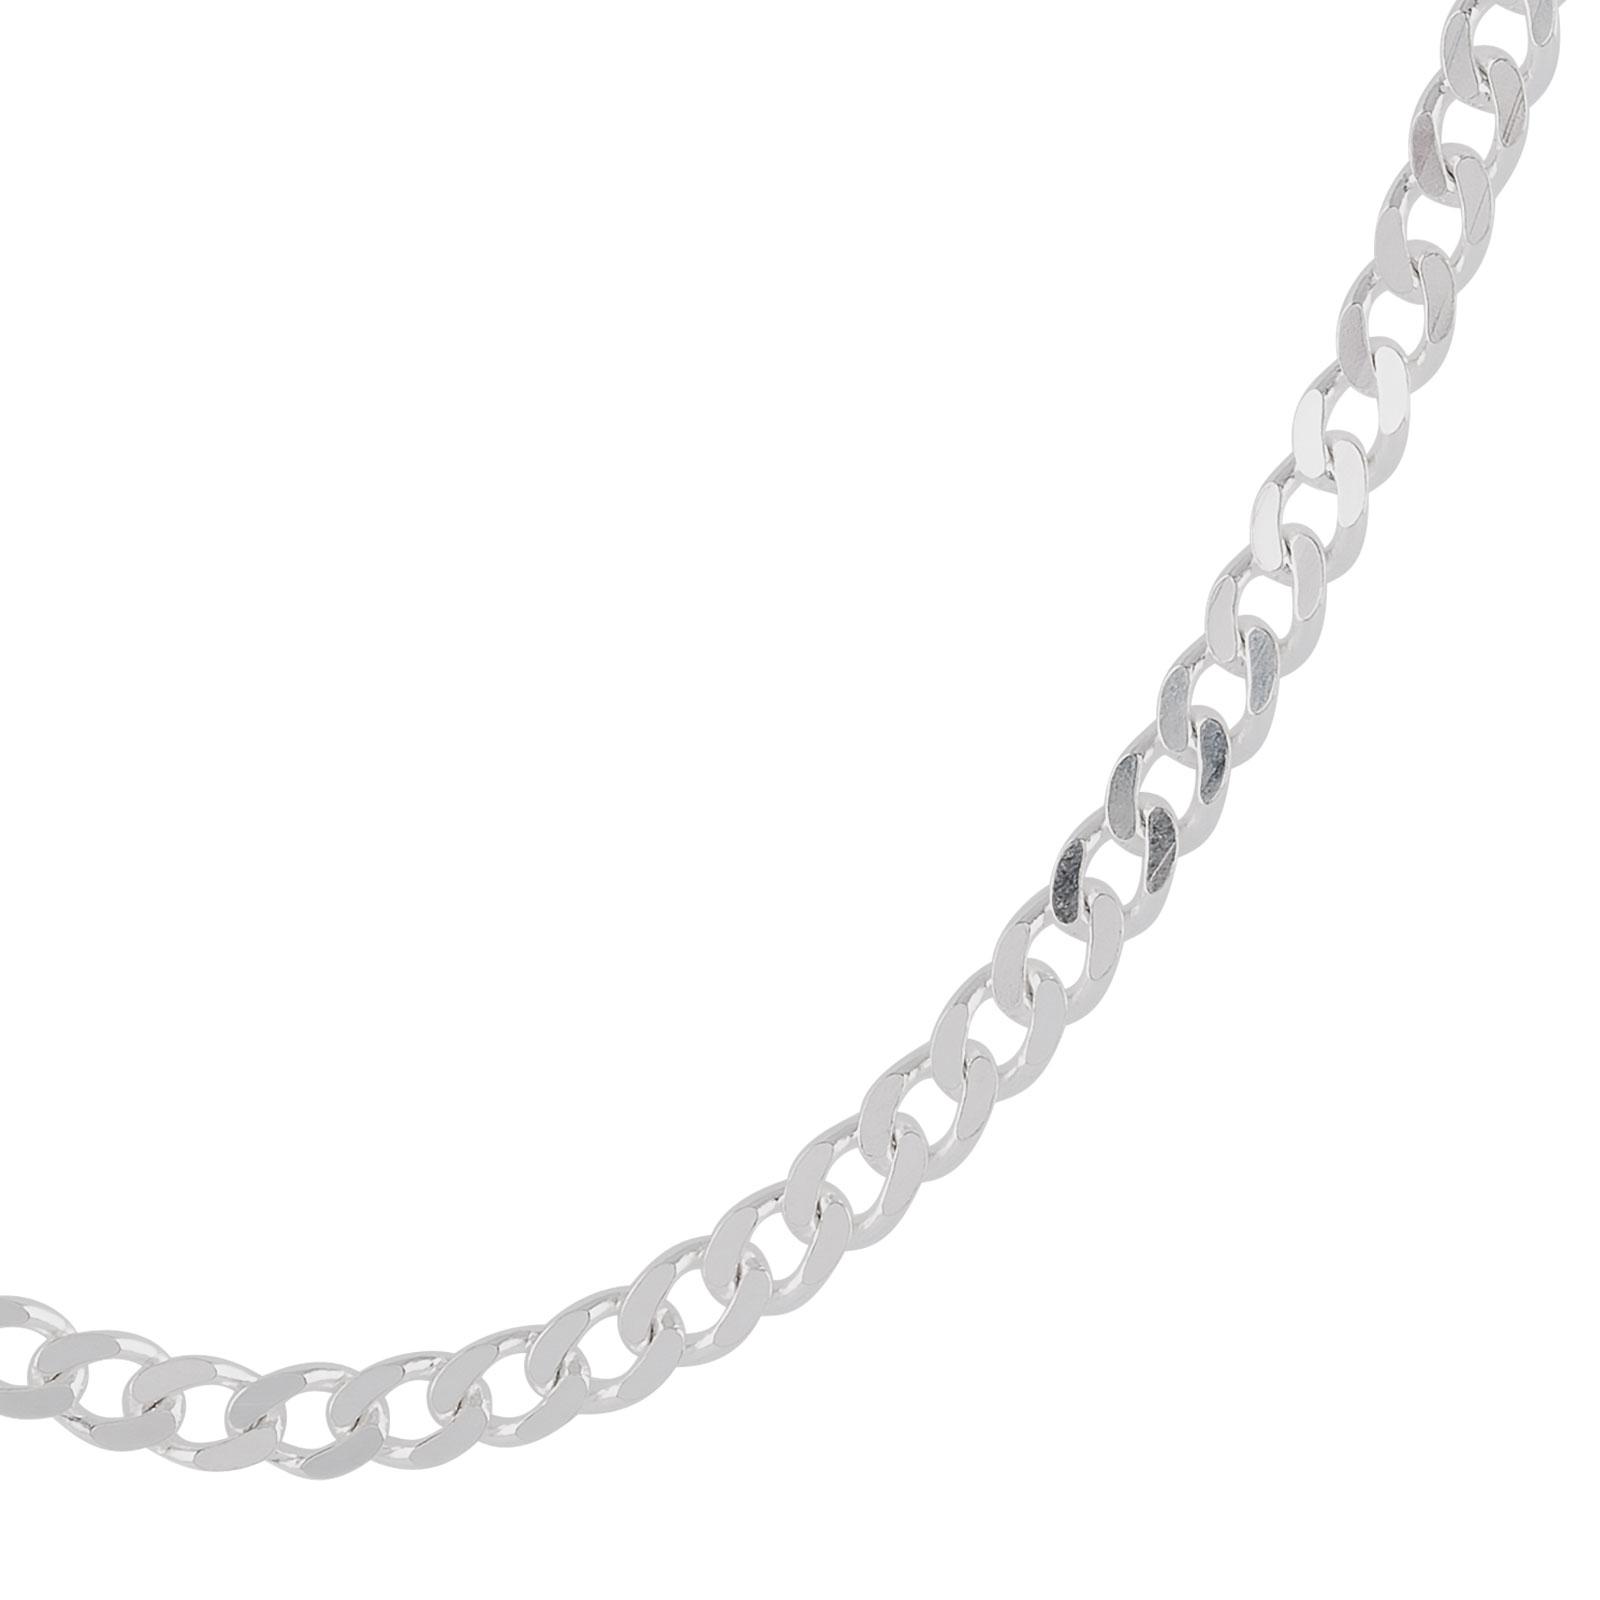 pansarlänk silver 925